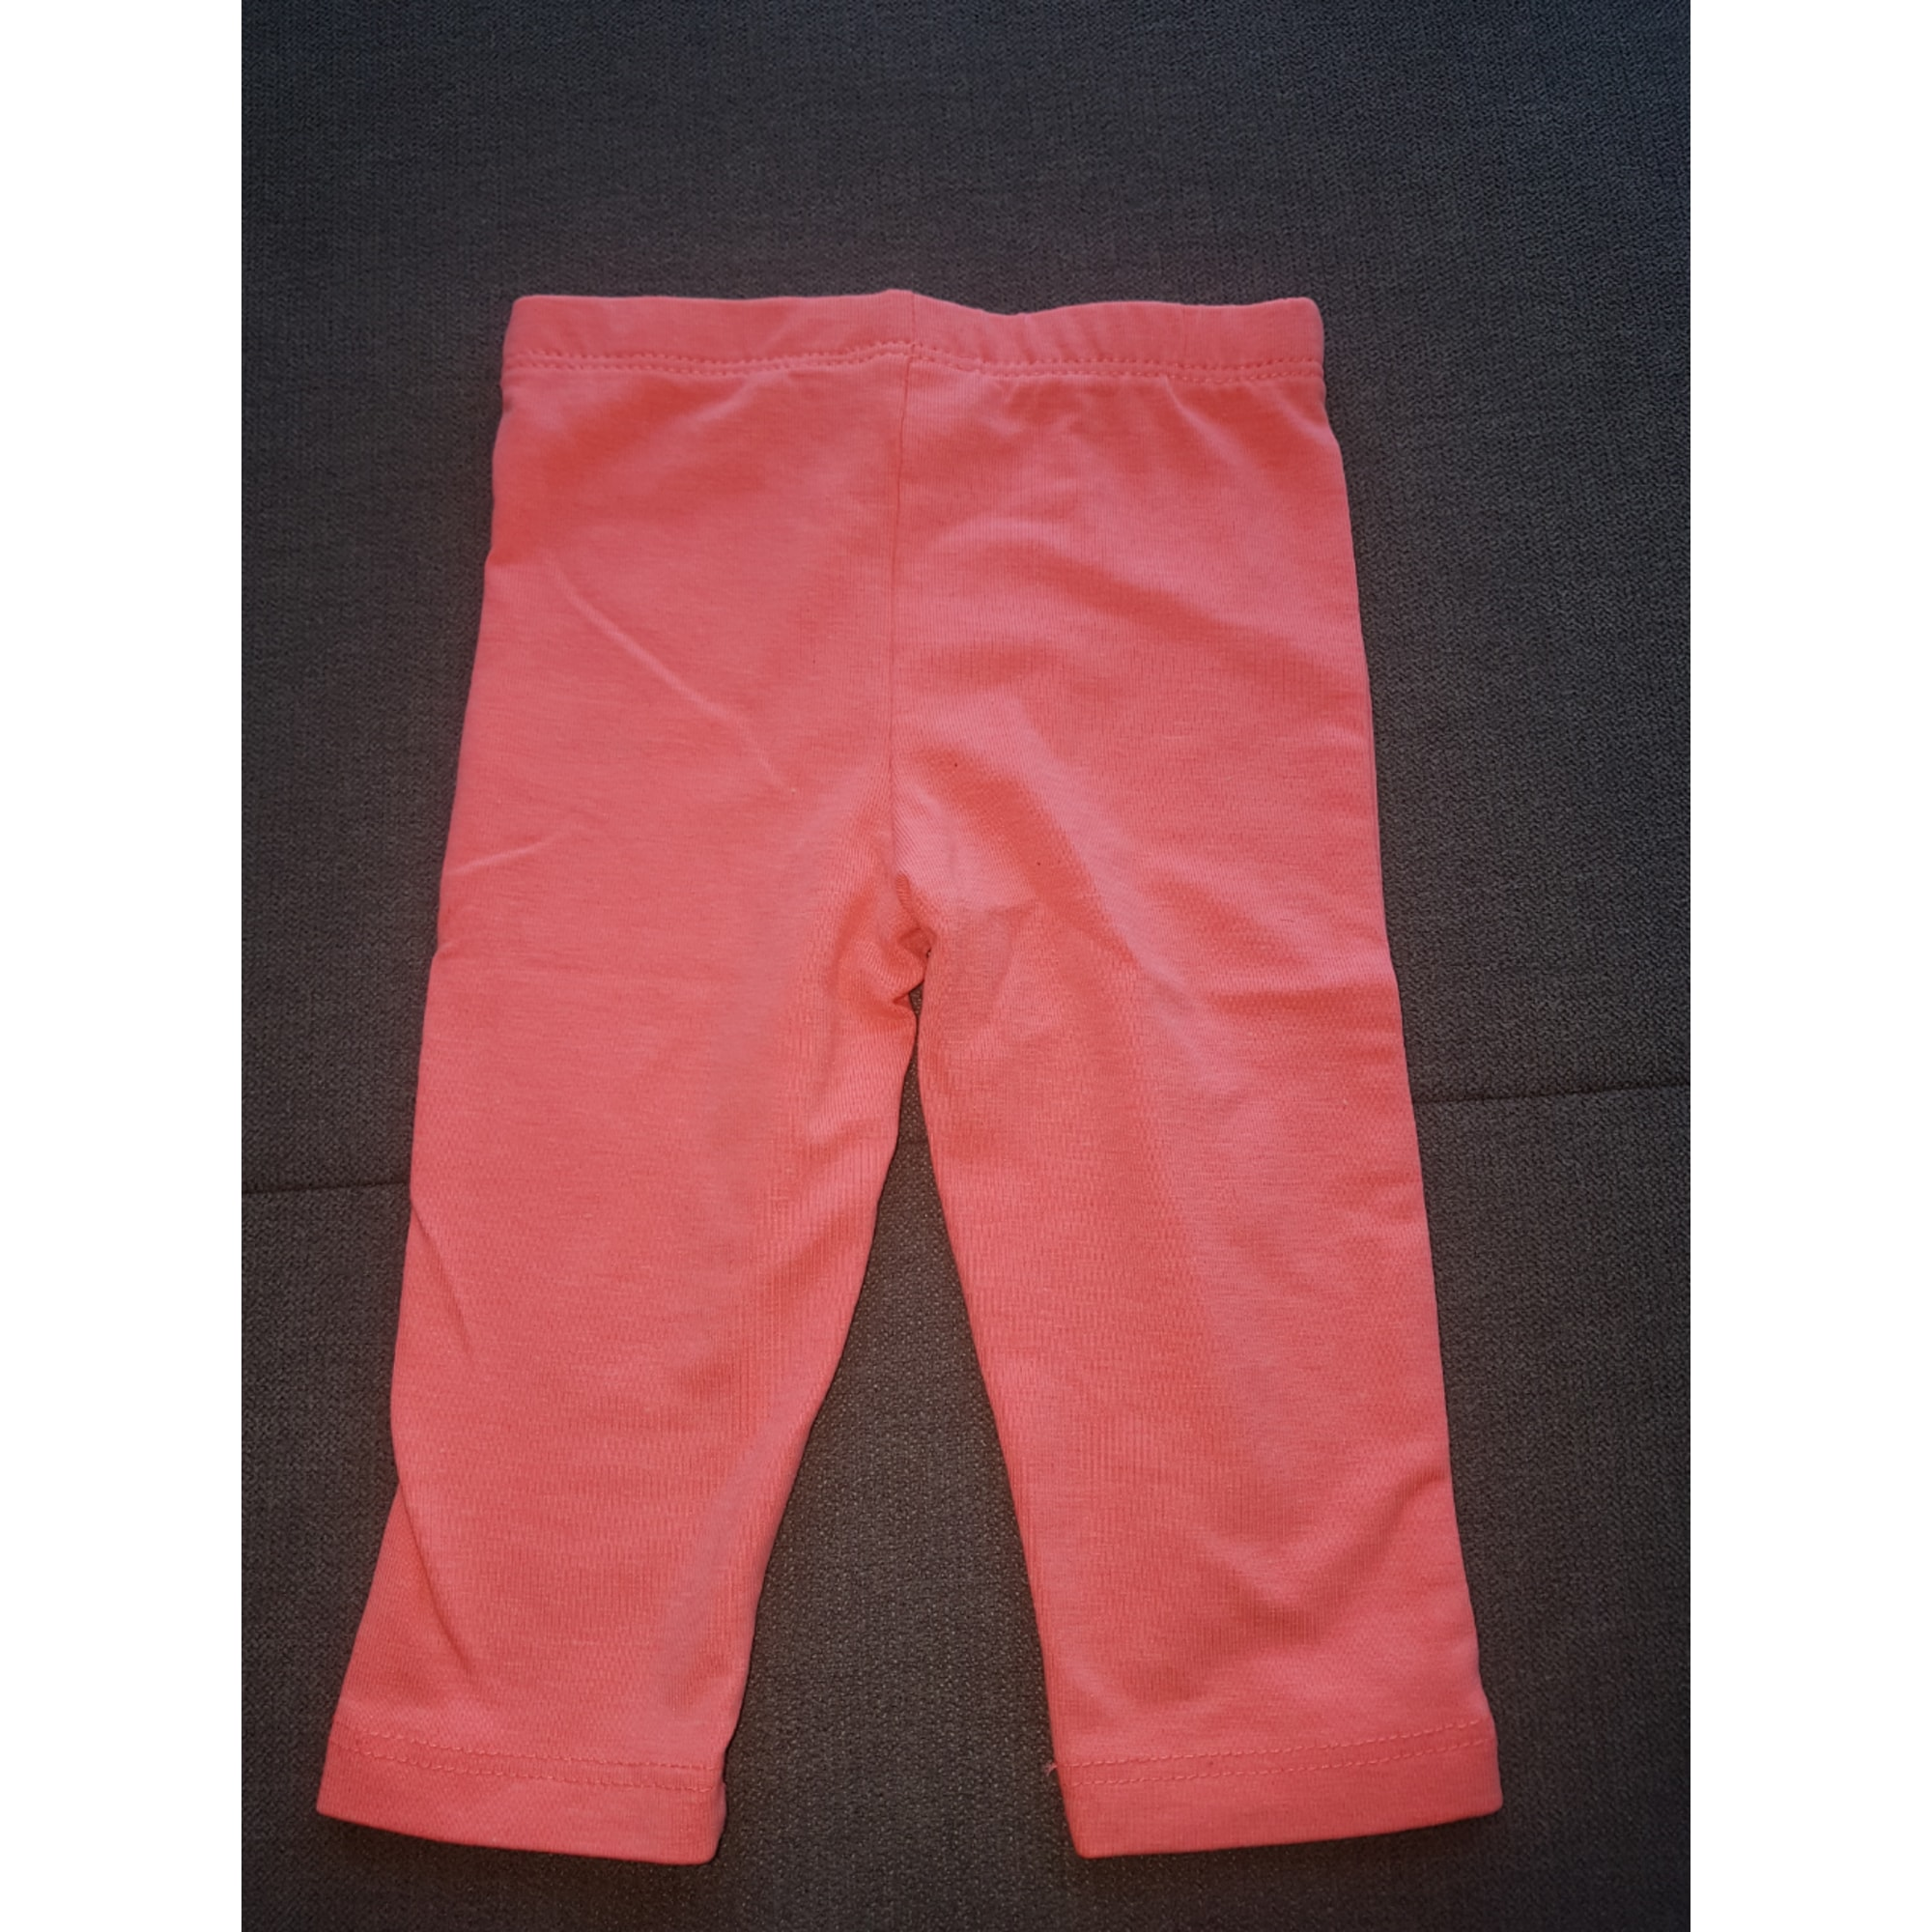 Pantalon TEX BABY Rose, fuschia, vieux rose